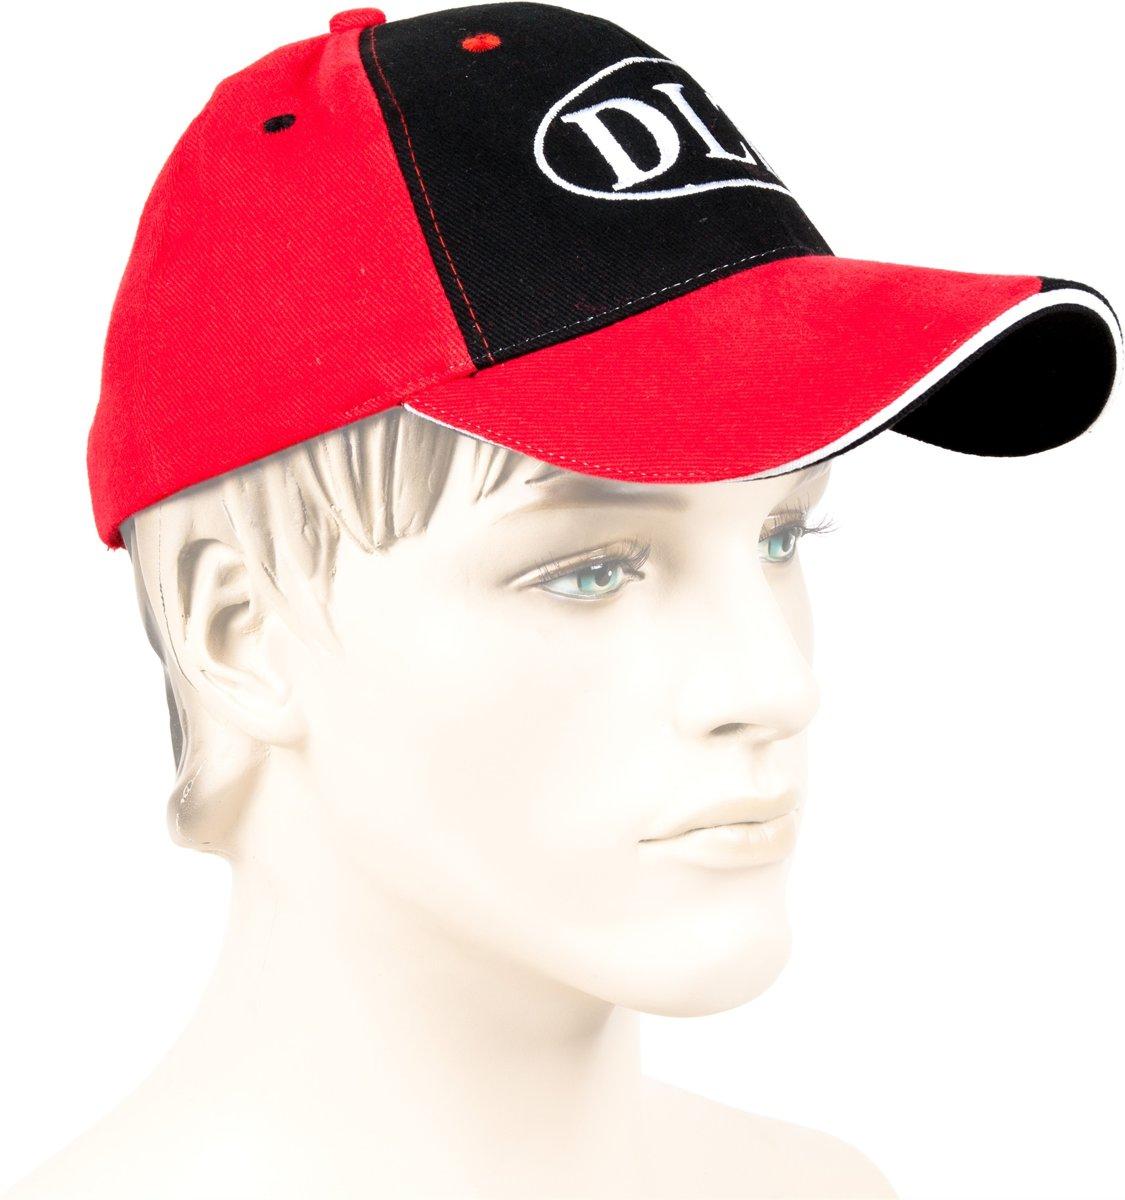 DLT - Cap - Unisex - Maat One size - Rood/Zwart